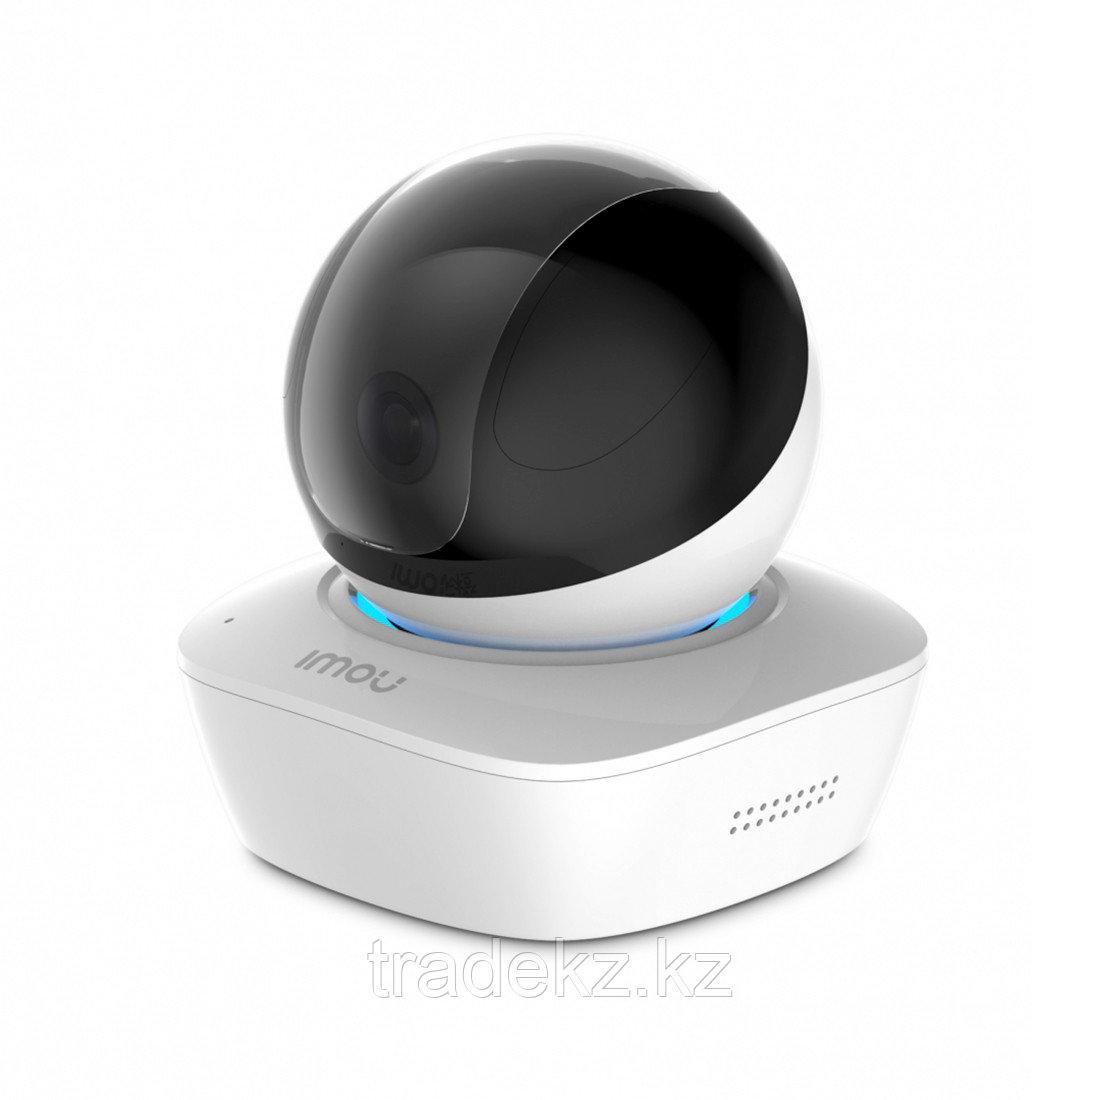 Интернет-камера, Wi-Fi видеокамера Imou Ranger Pro Z, поворотная